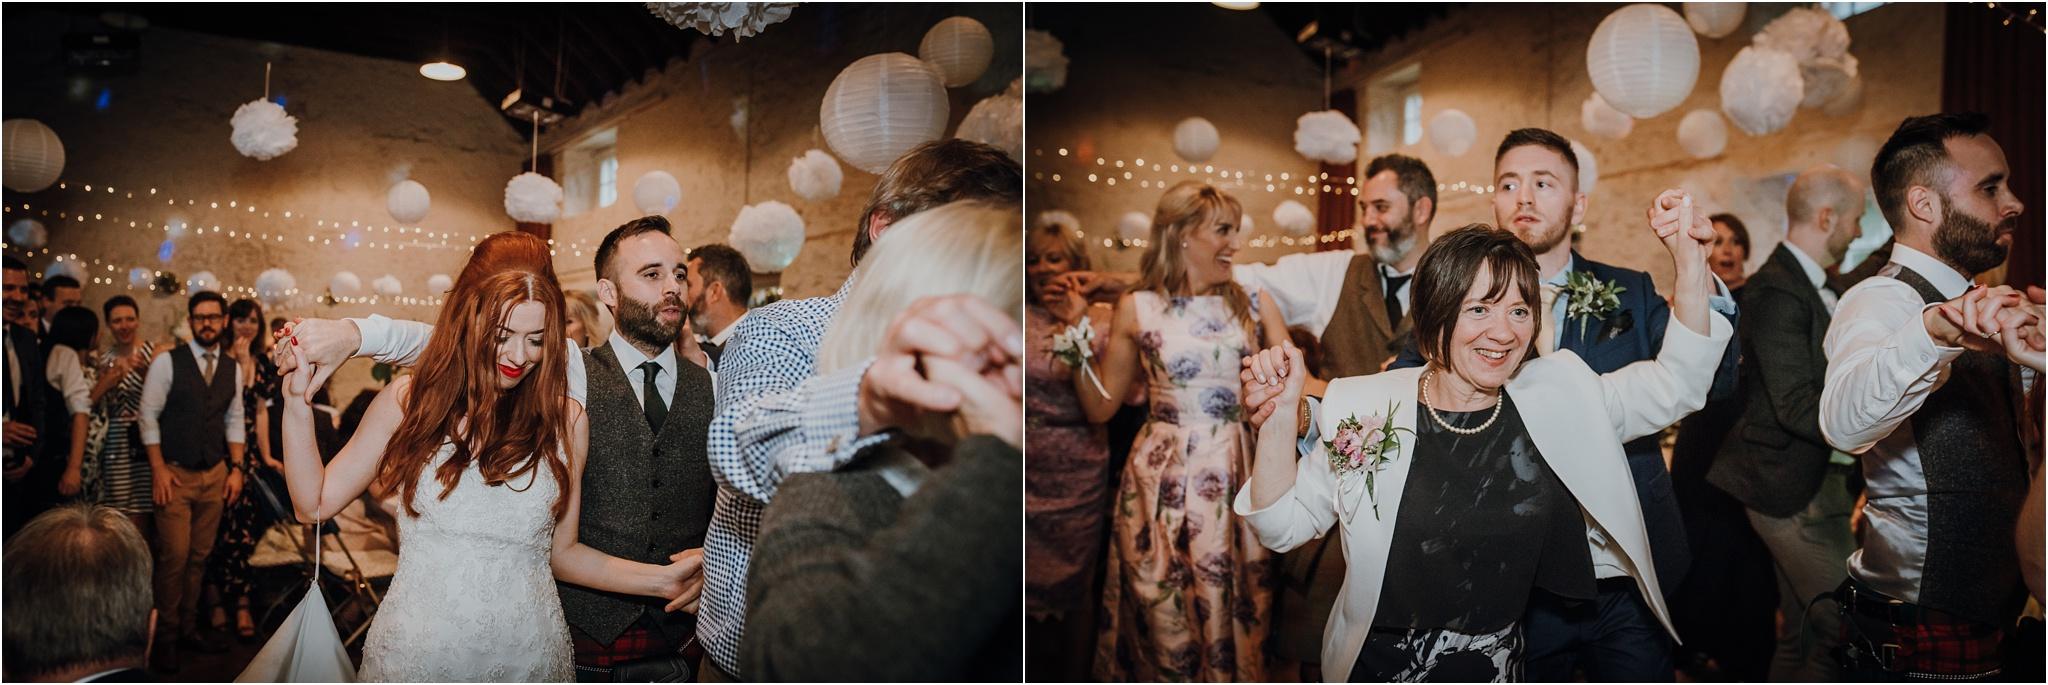 Tyninghame-Village-hall-wedding_0081.jpg